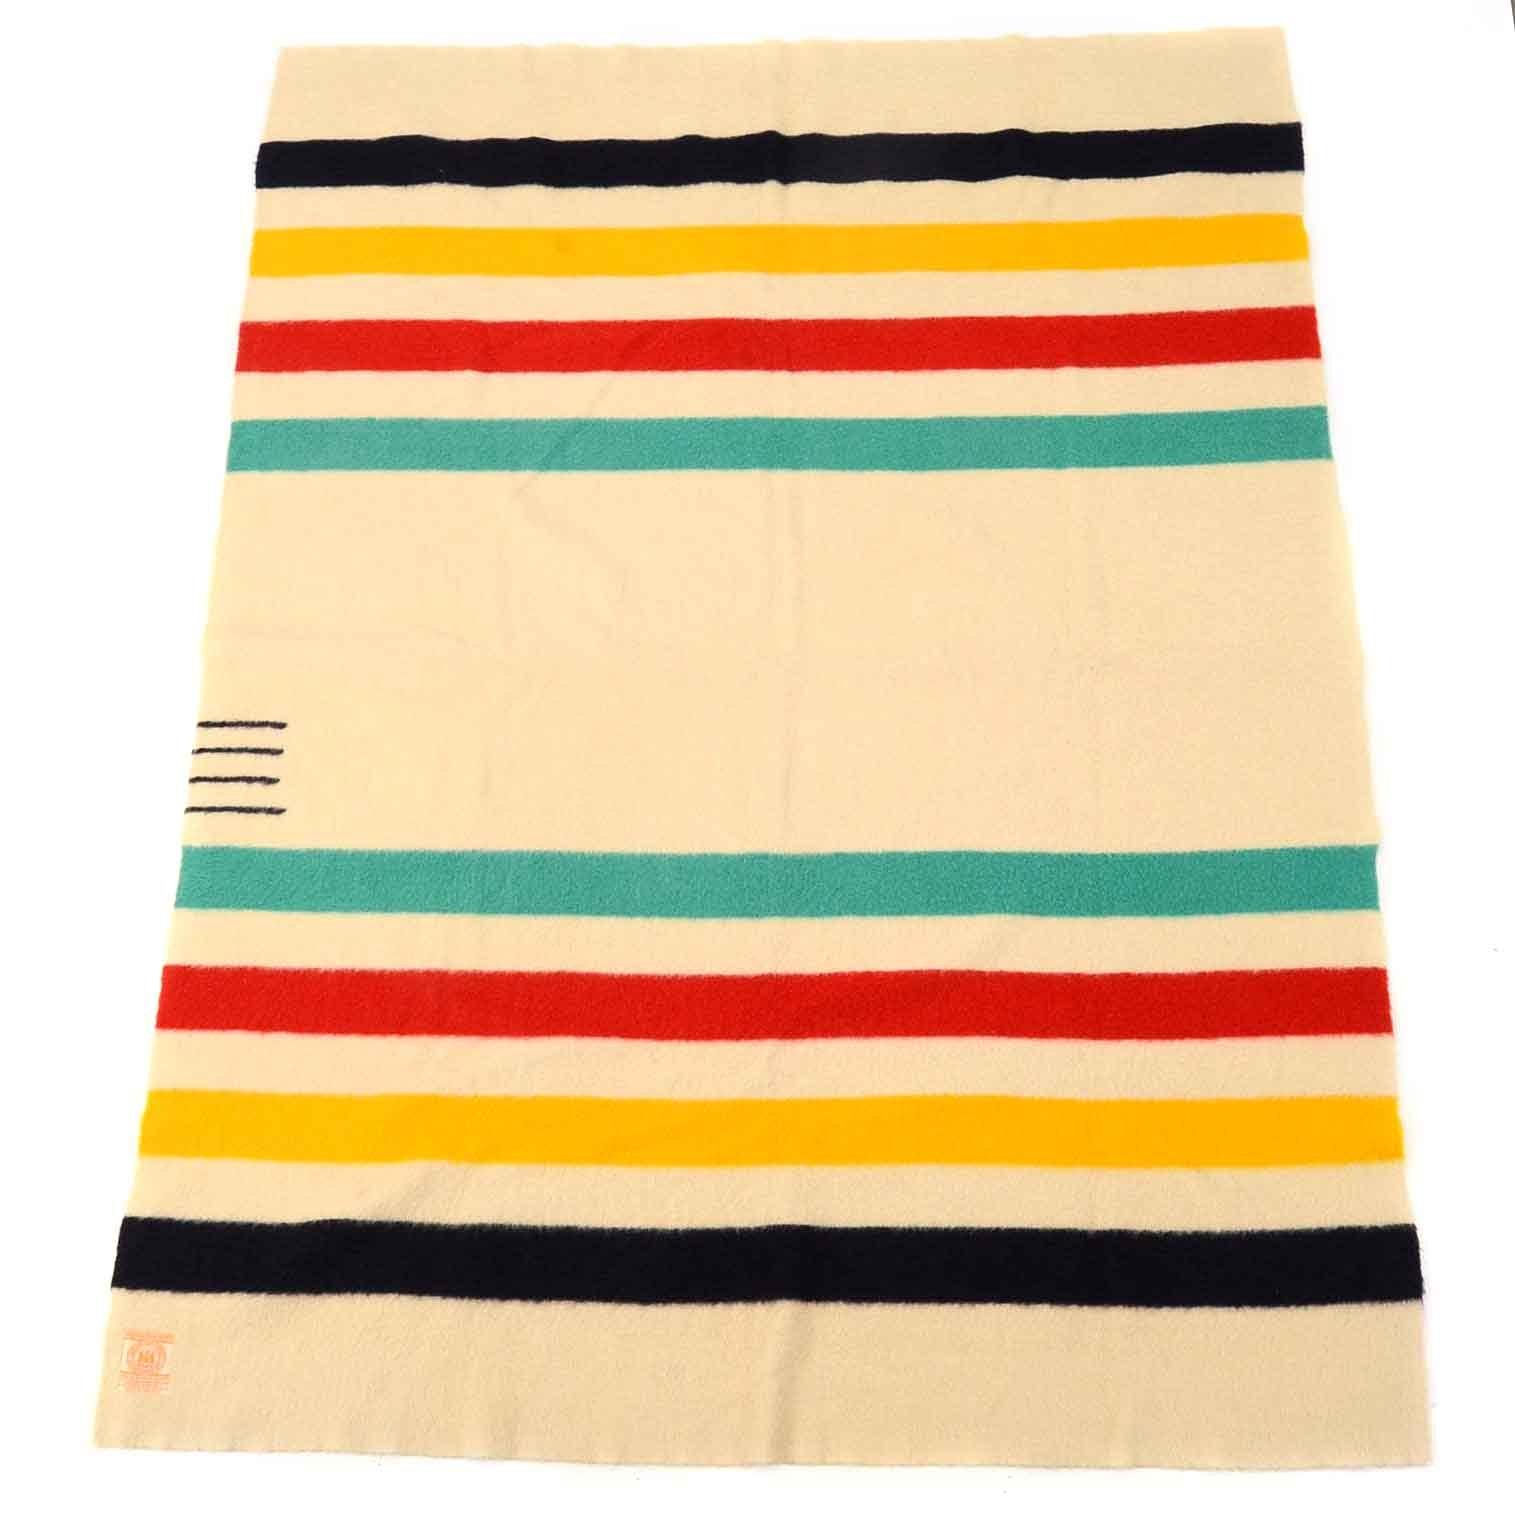 Vintage Hudson's Bay Company Point Blanket